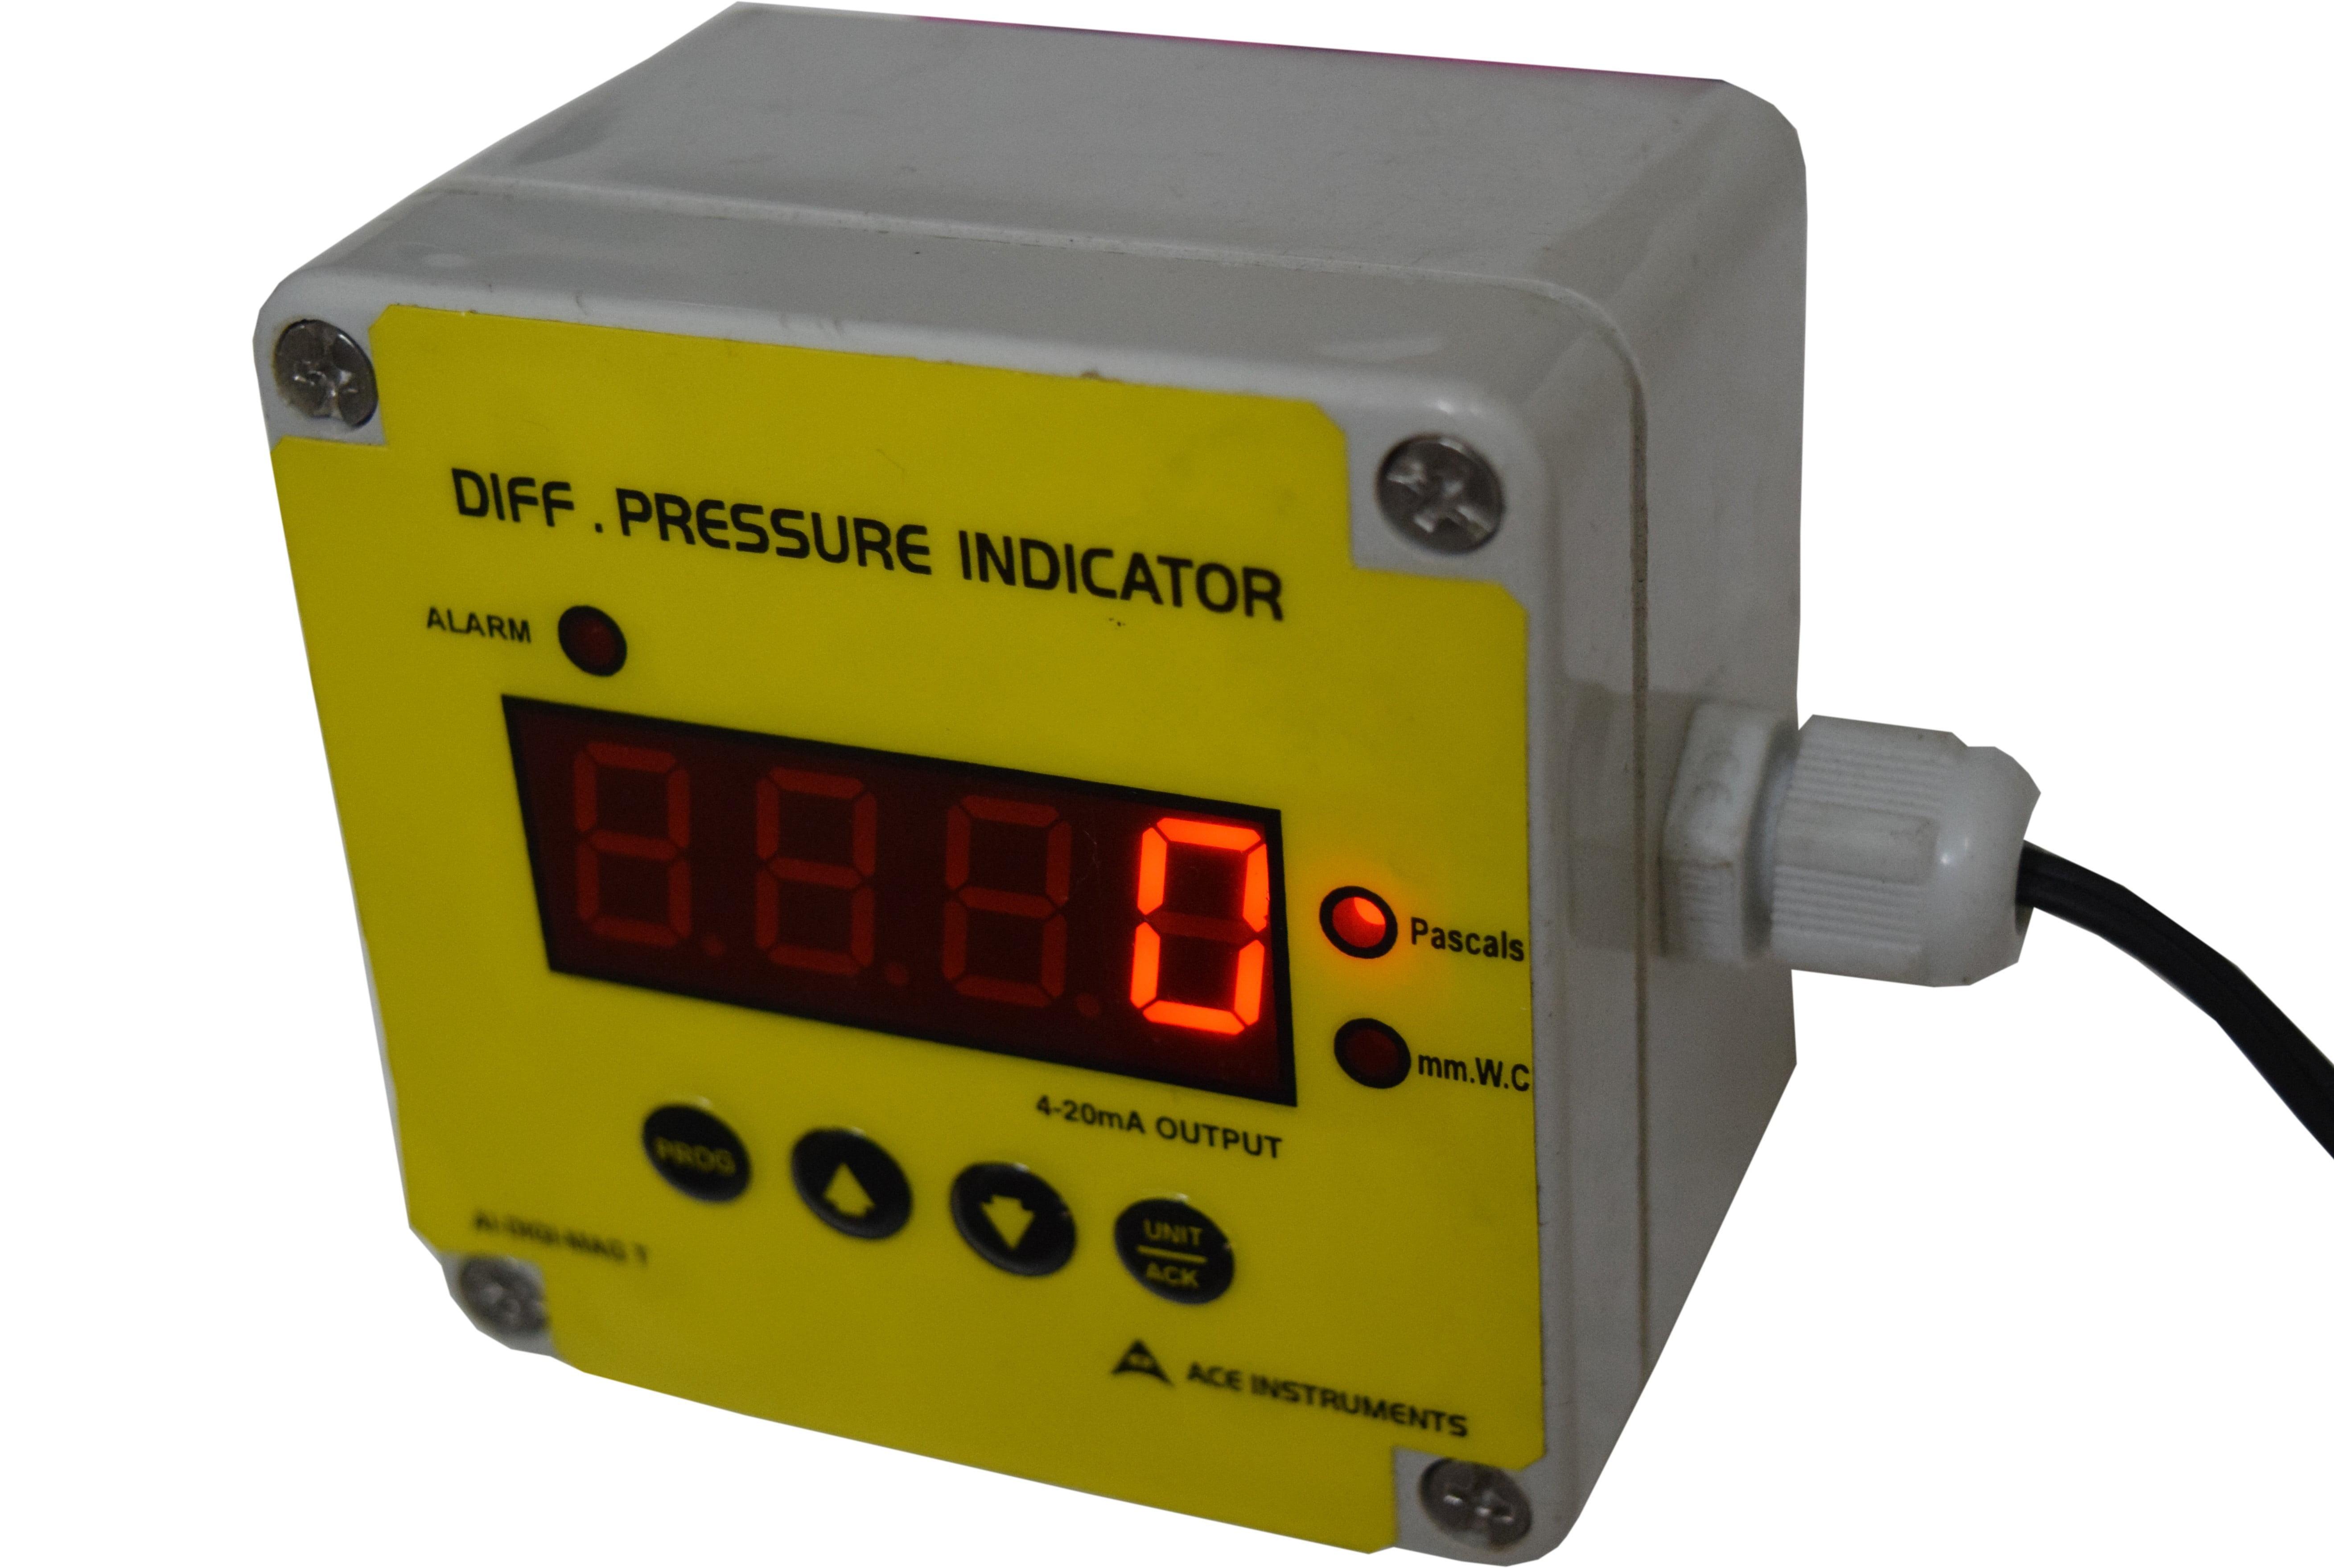 ACE AI-DIGI-MAG-T Digital Differential Pressure Transmitter